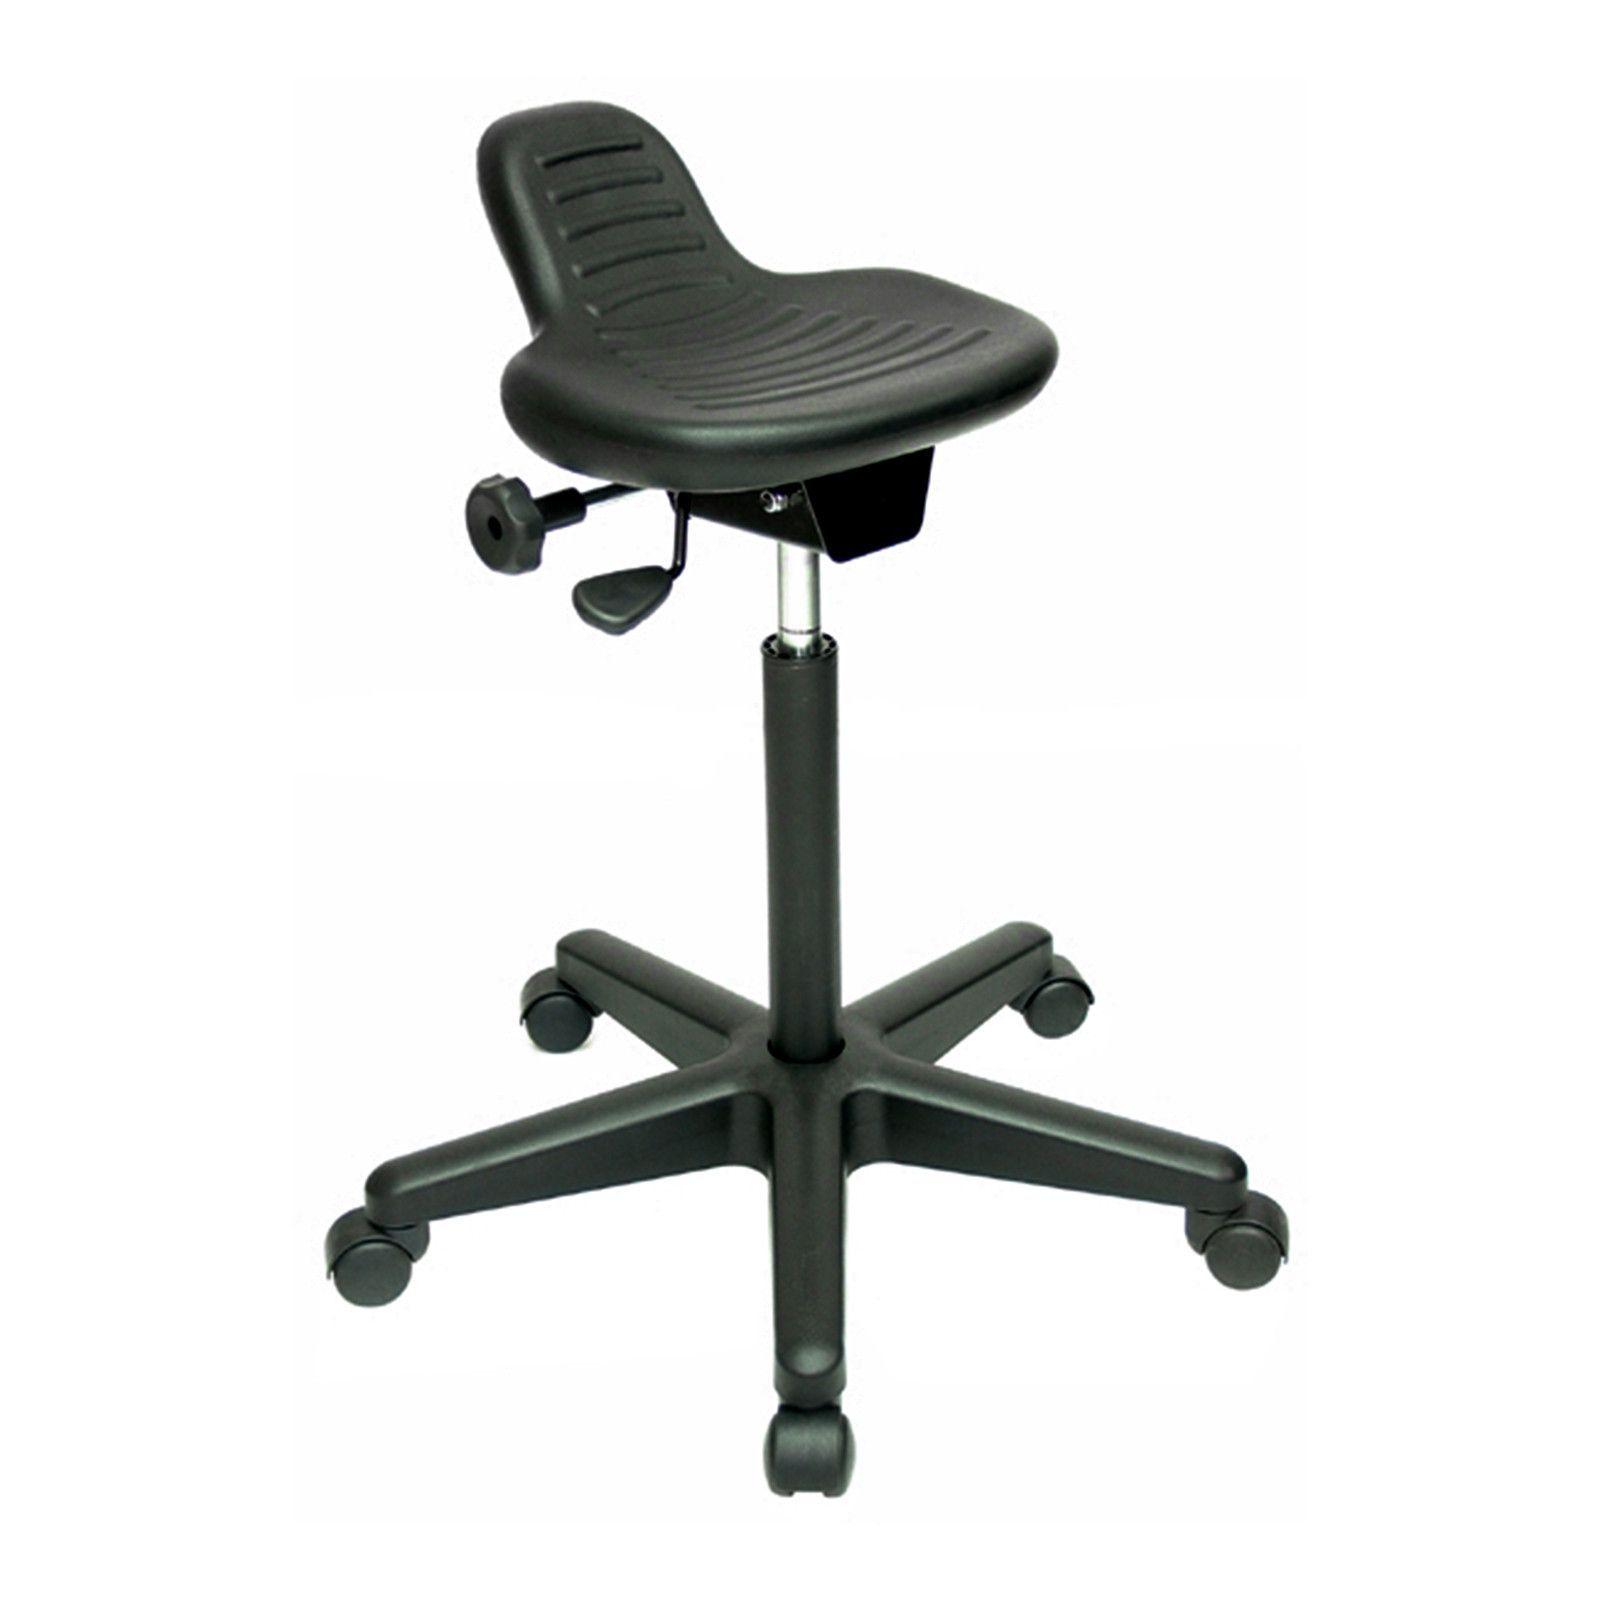 Werk AX Sit Stand Ergonomic Stool By Jobri; BP1470BK